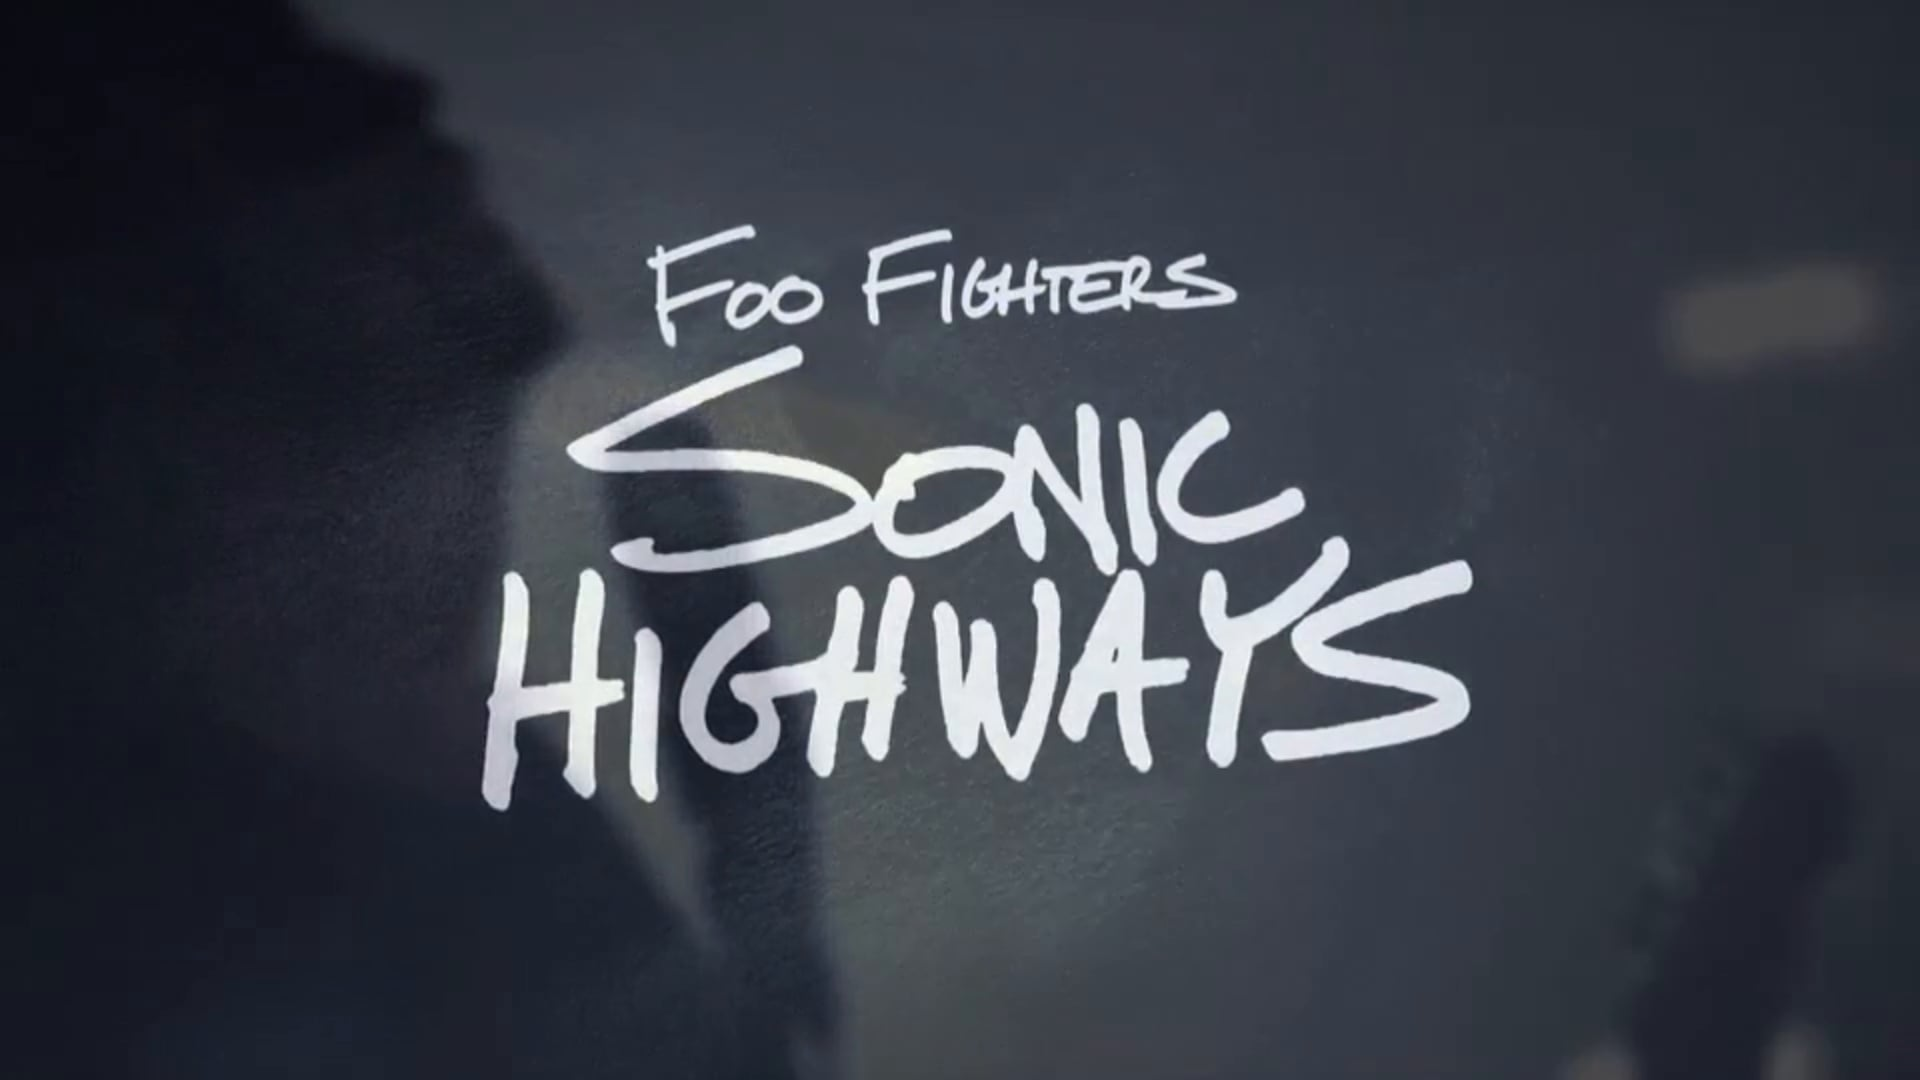 Foo Fighters Sonic Highways Trailer